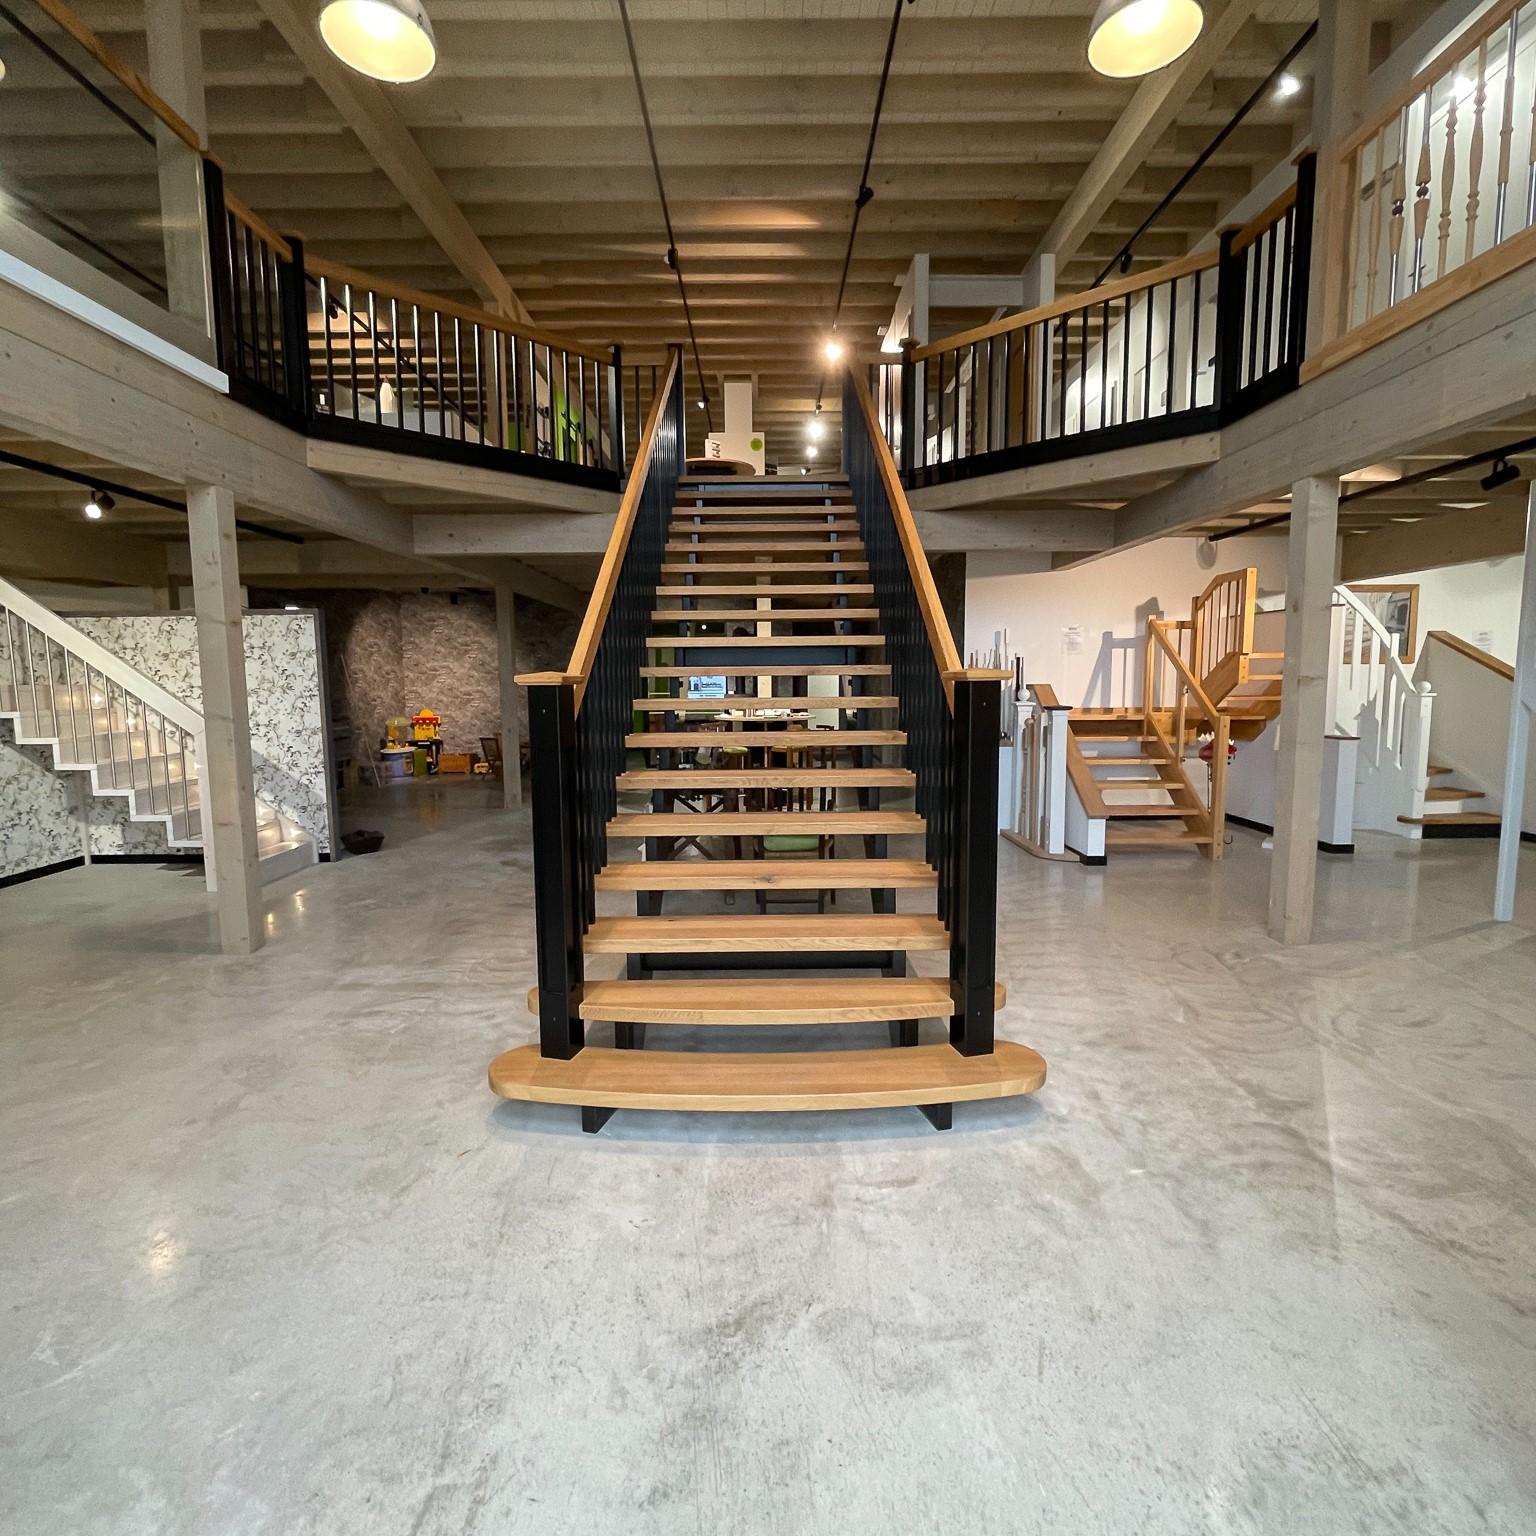 Massivholzplatten als Treppenstufen